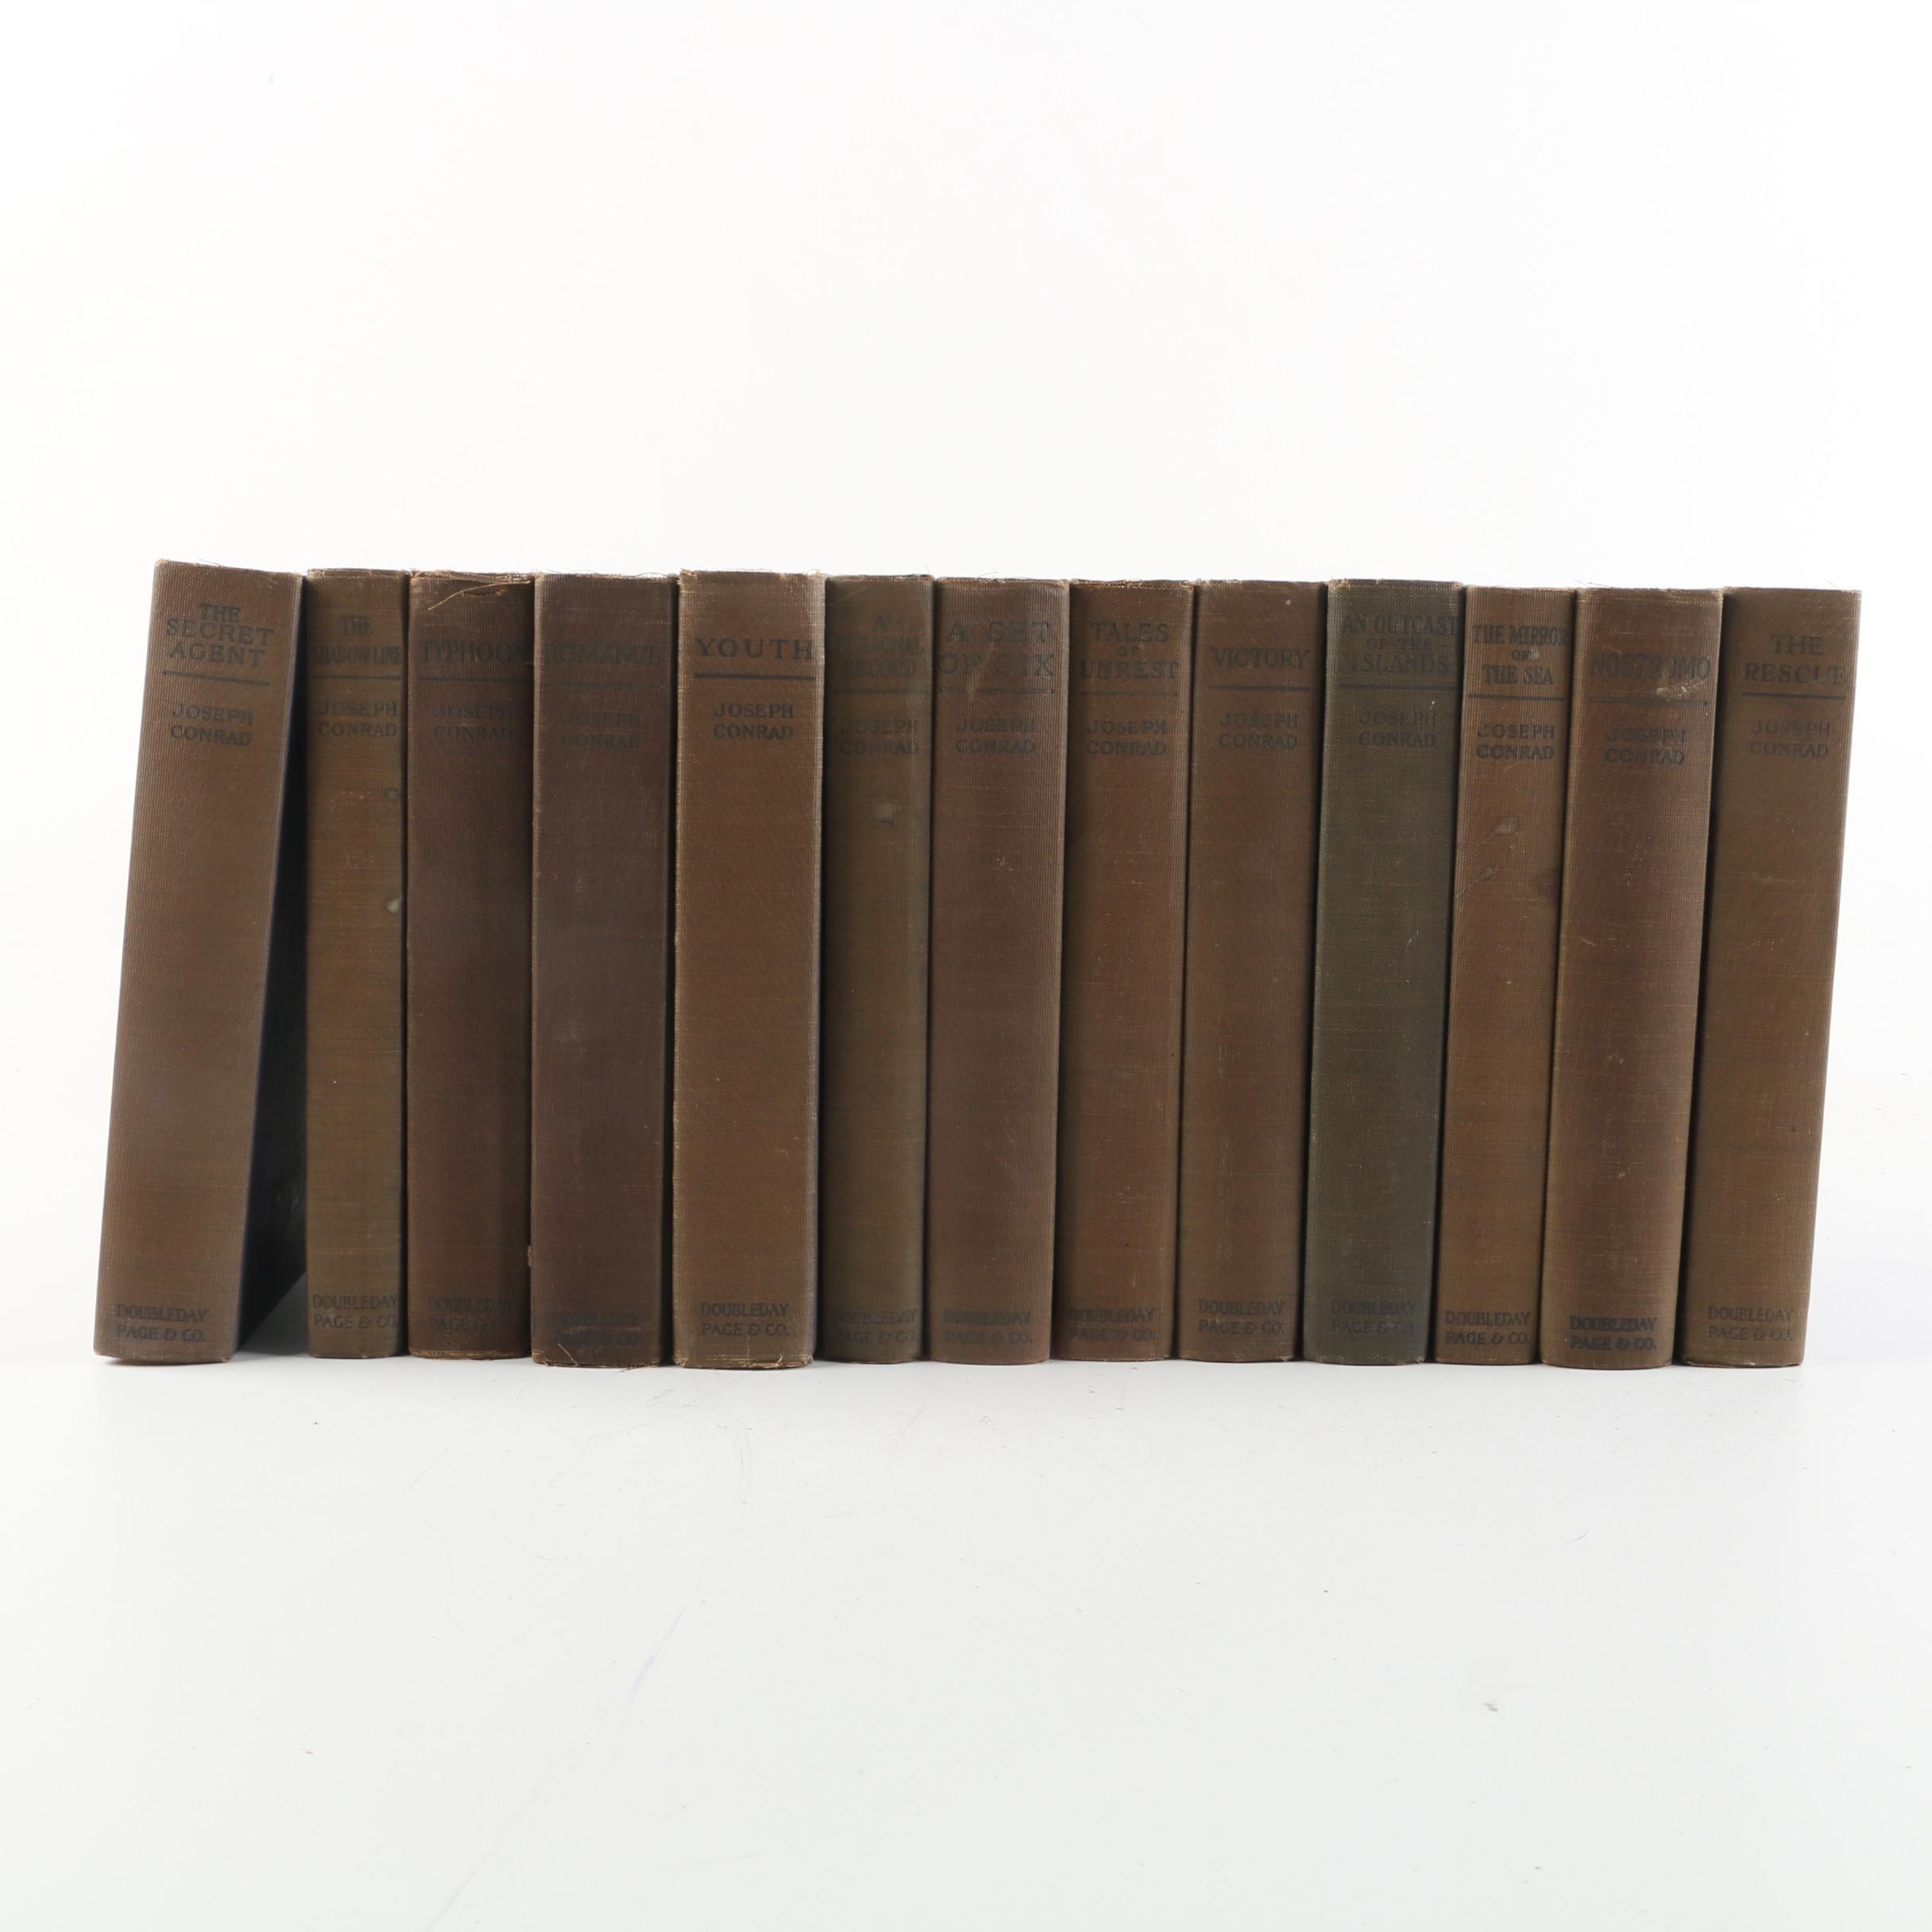 1920s Thirteen Volume Set of Joseph Conrad's Works